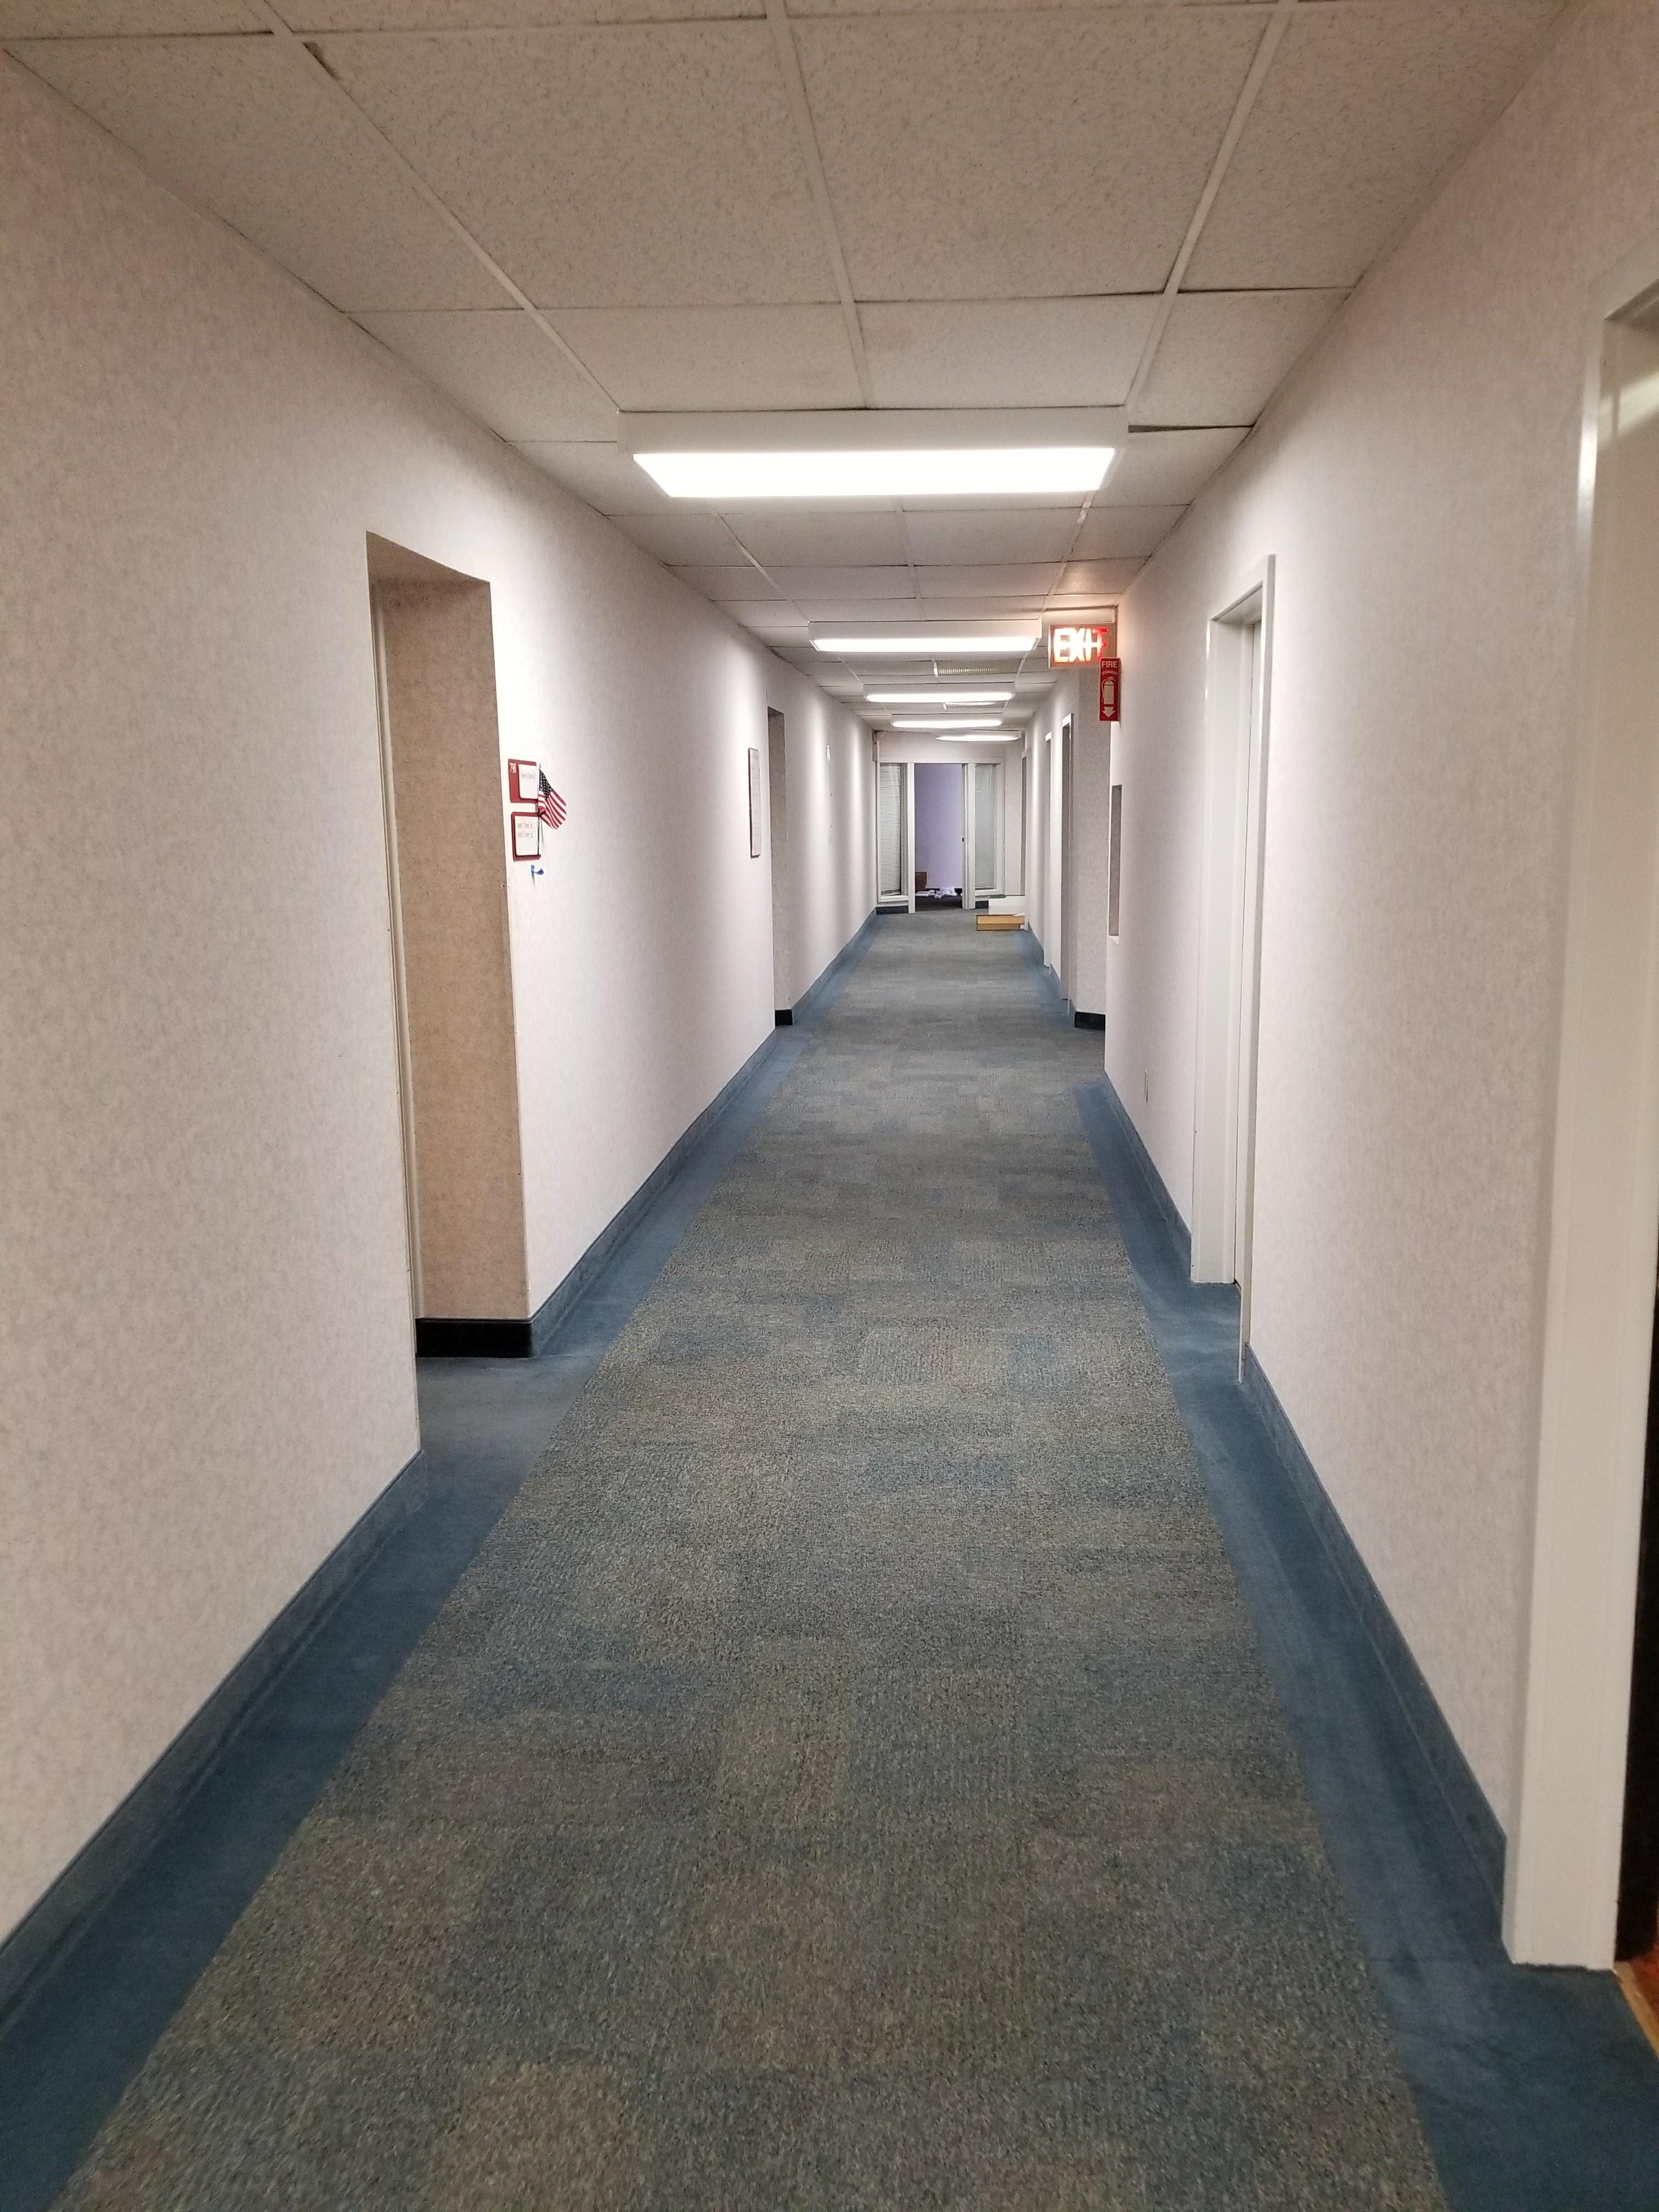 Hallway LED Retrofit